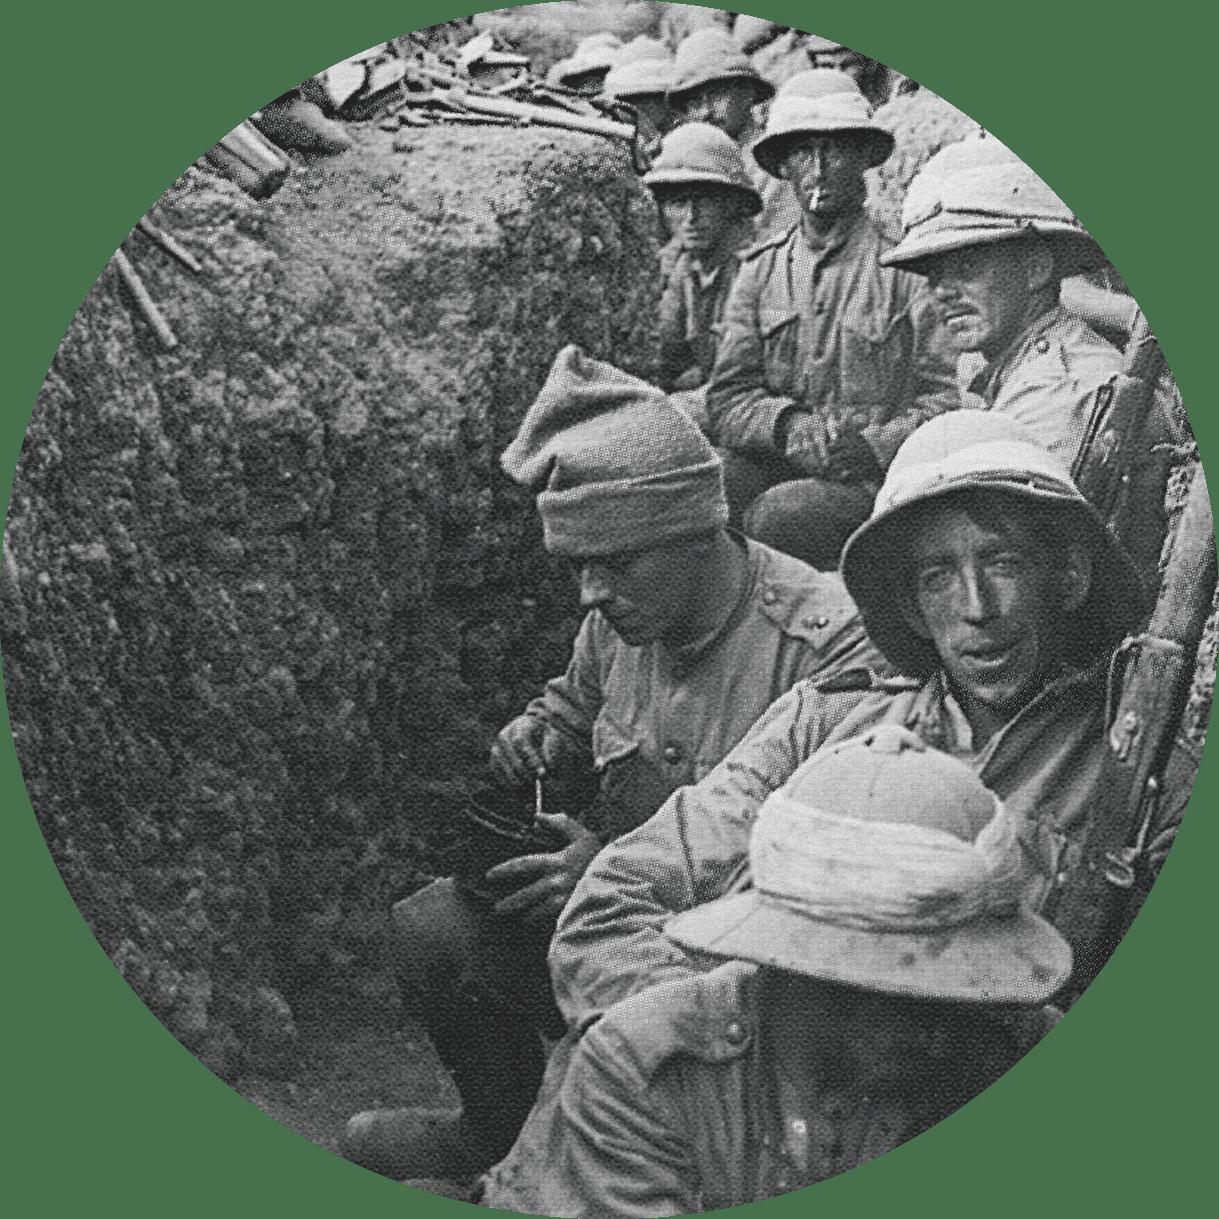 Norman Edwards, soldats 1914-1918